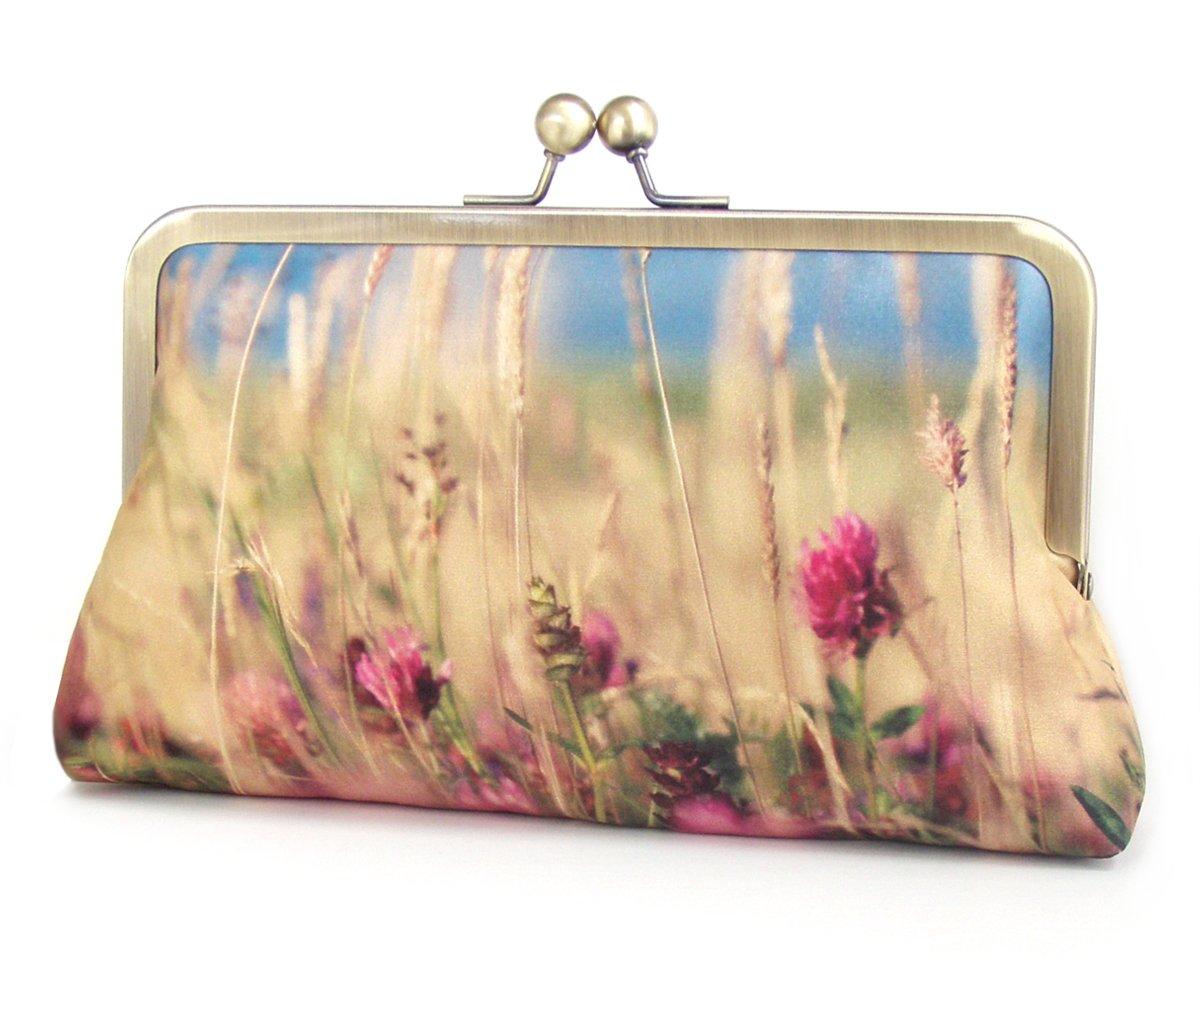 Image of Wildflowers purse